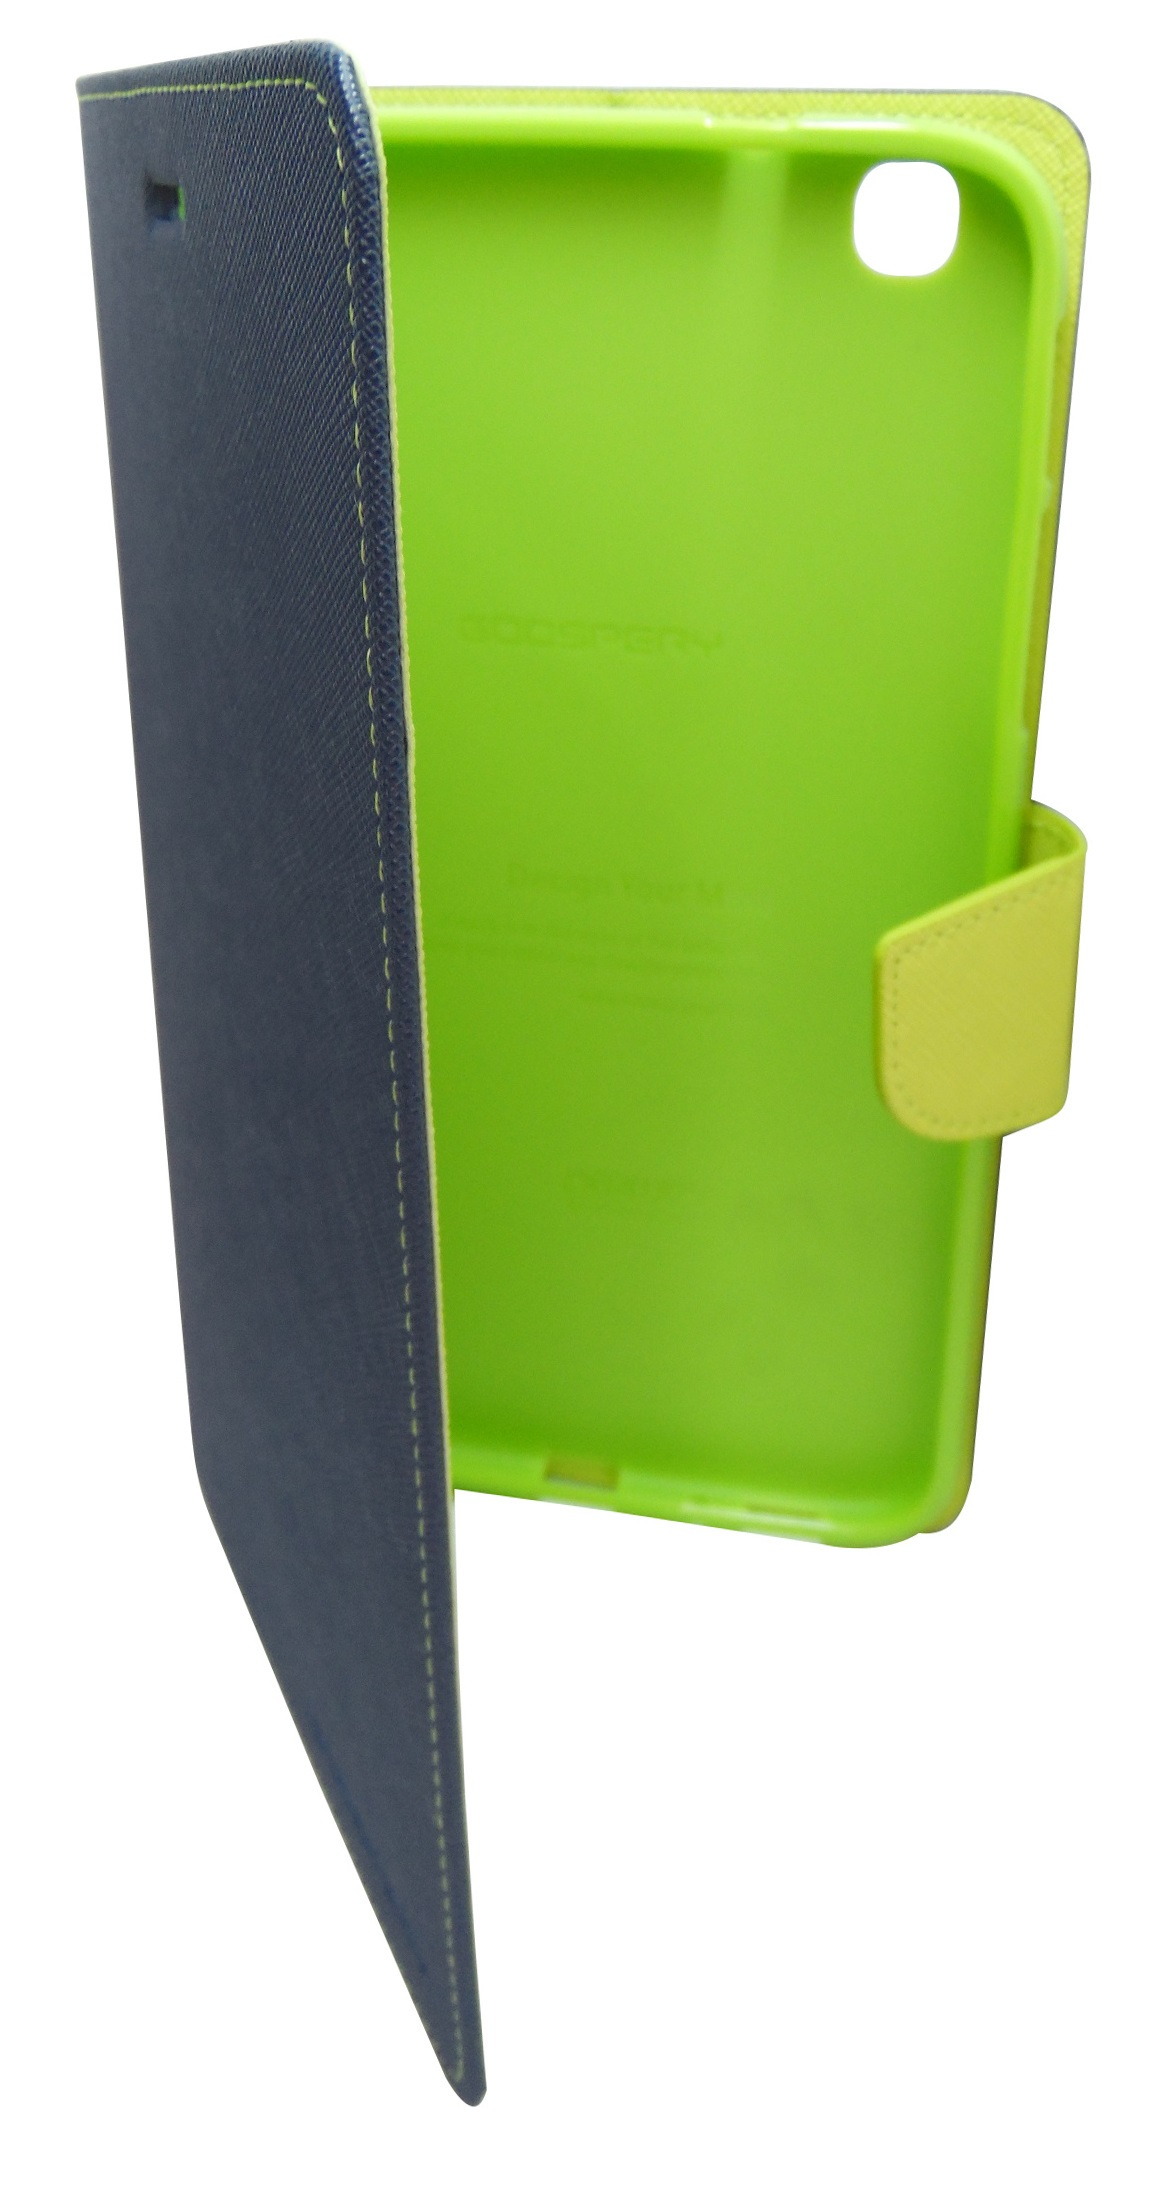 Husa tip carte Mercury Goospery Fancy Diary bleumarin + verde deschis pentru Samsung Galaxy Tab 3 8.0 (SM-T310, SM-T311, SM-T315)